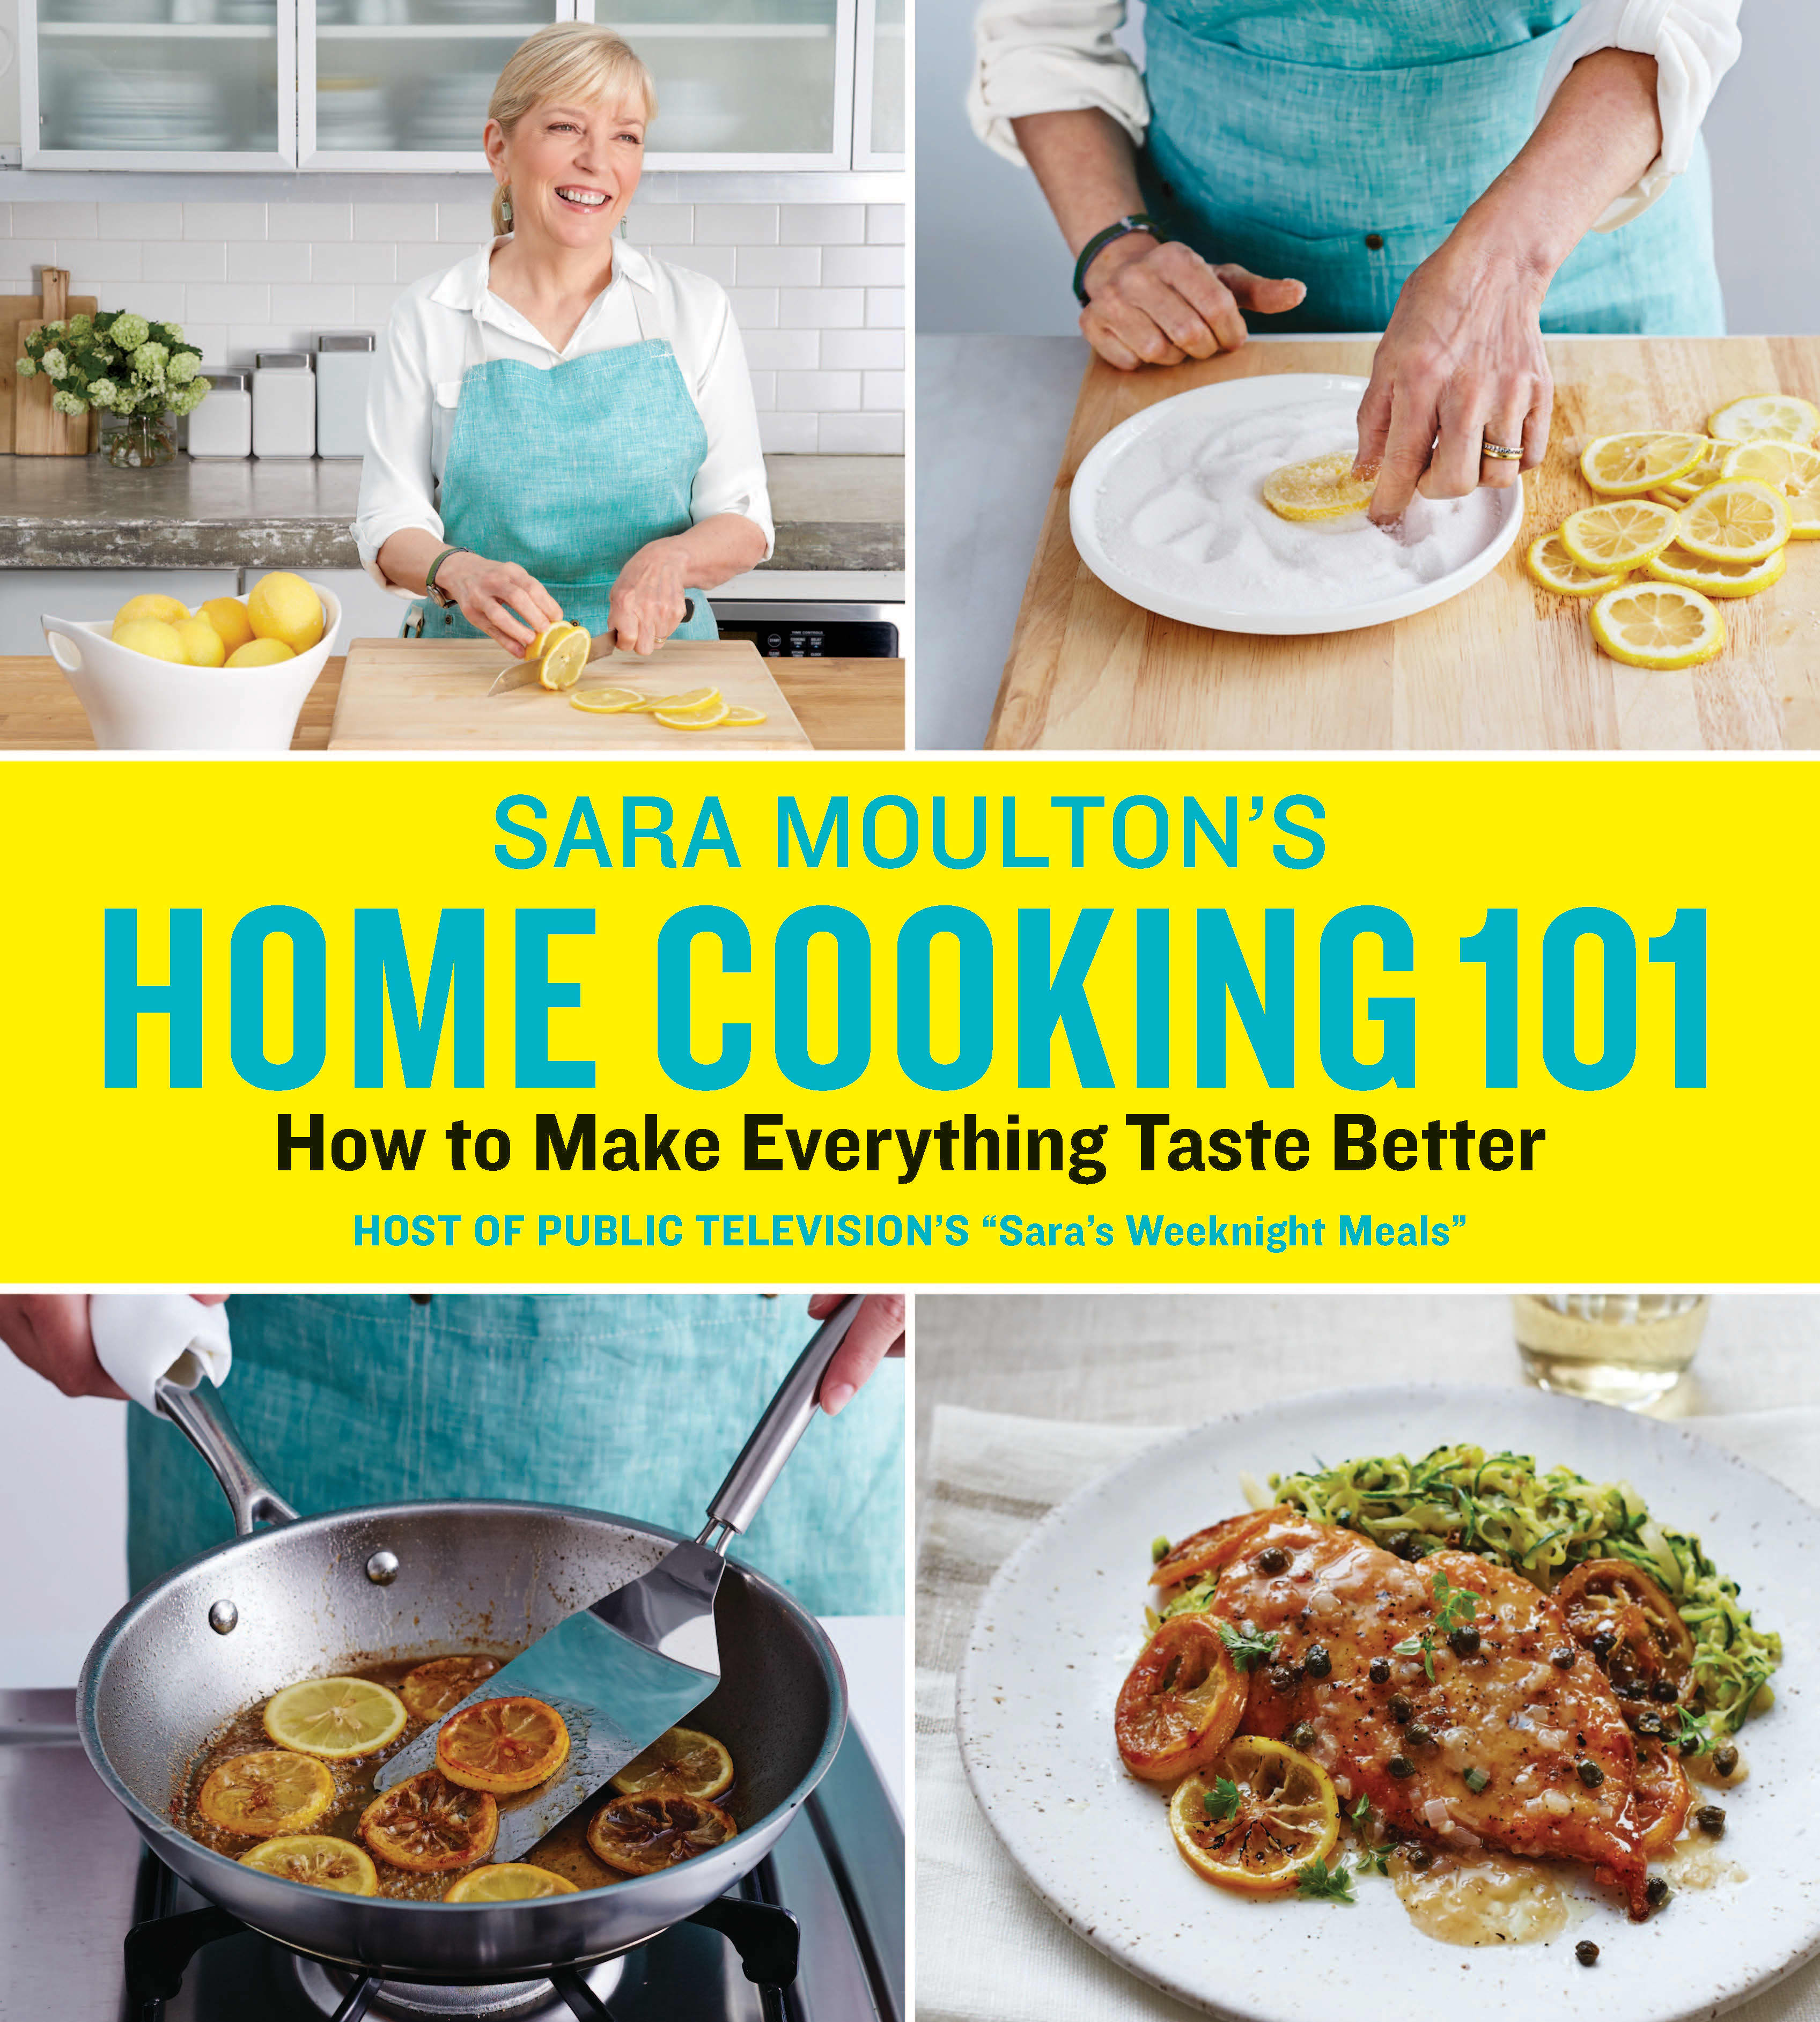 Sara Moulton's Home Cooking 101 Book Cover